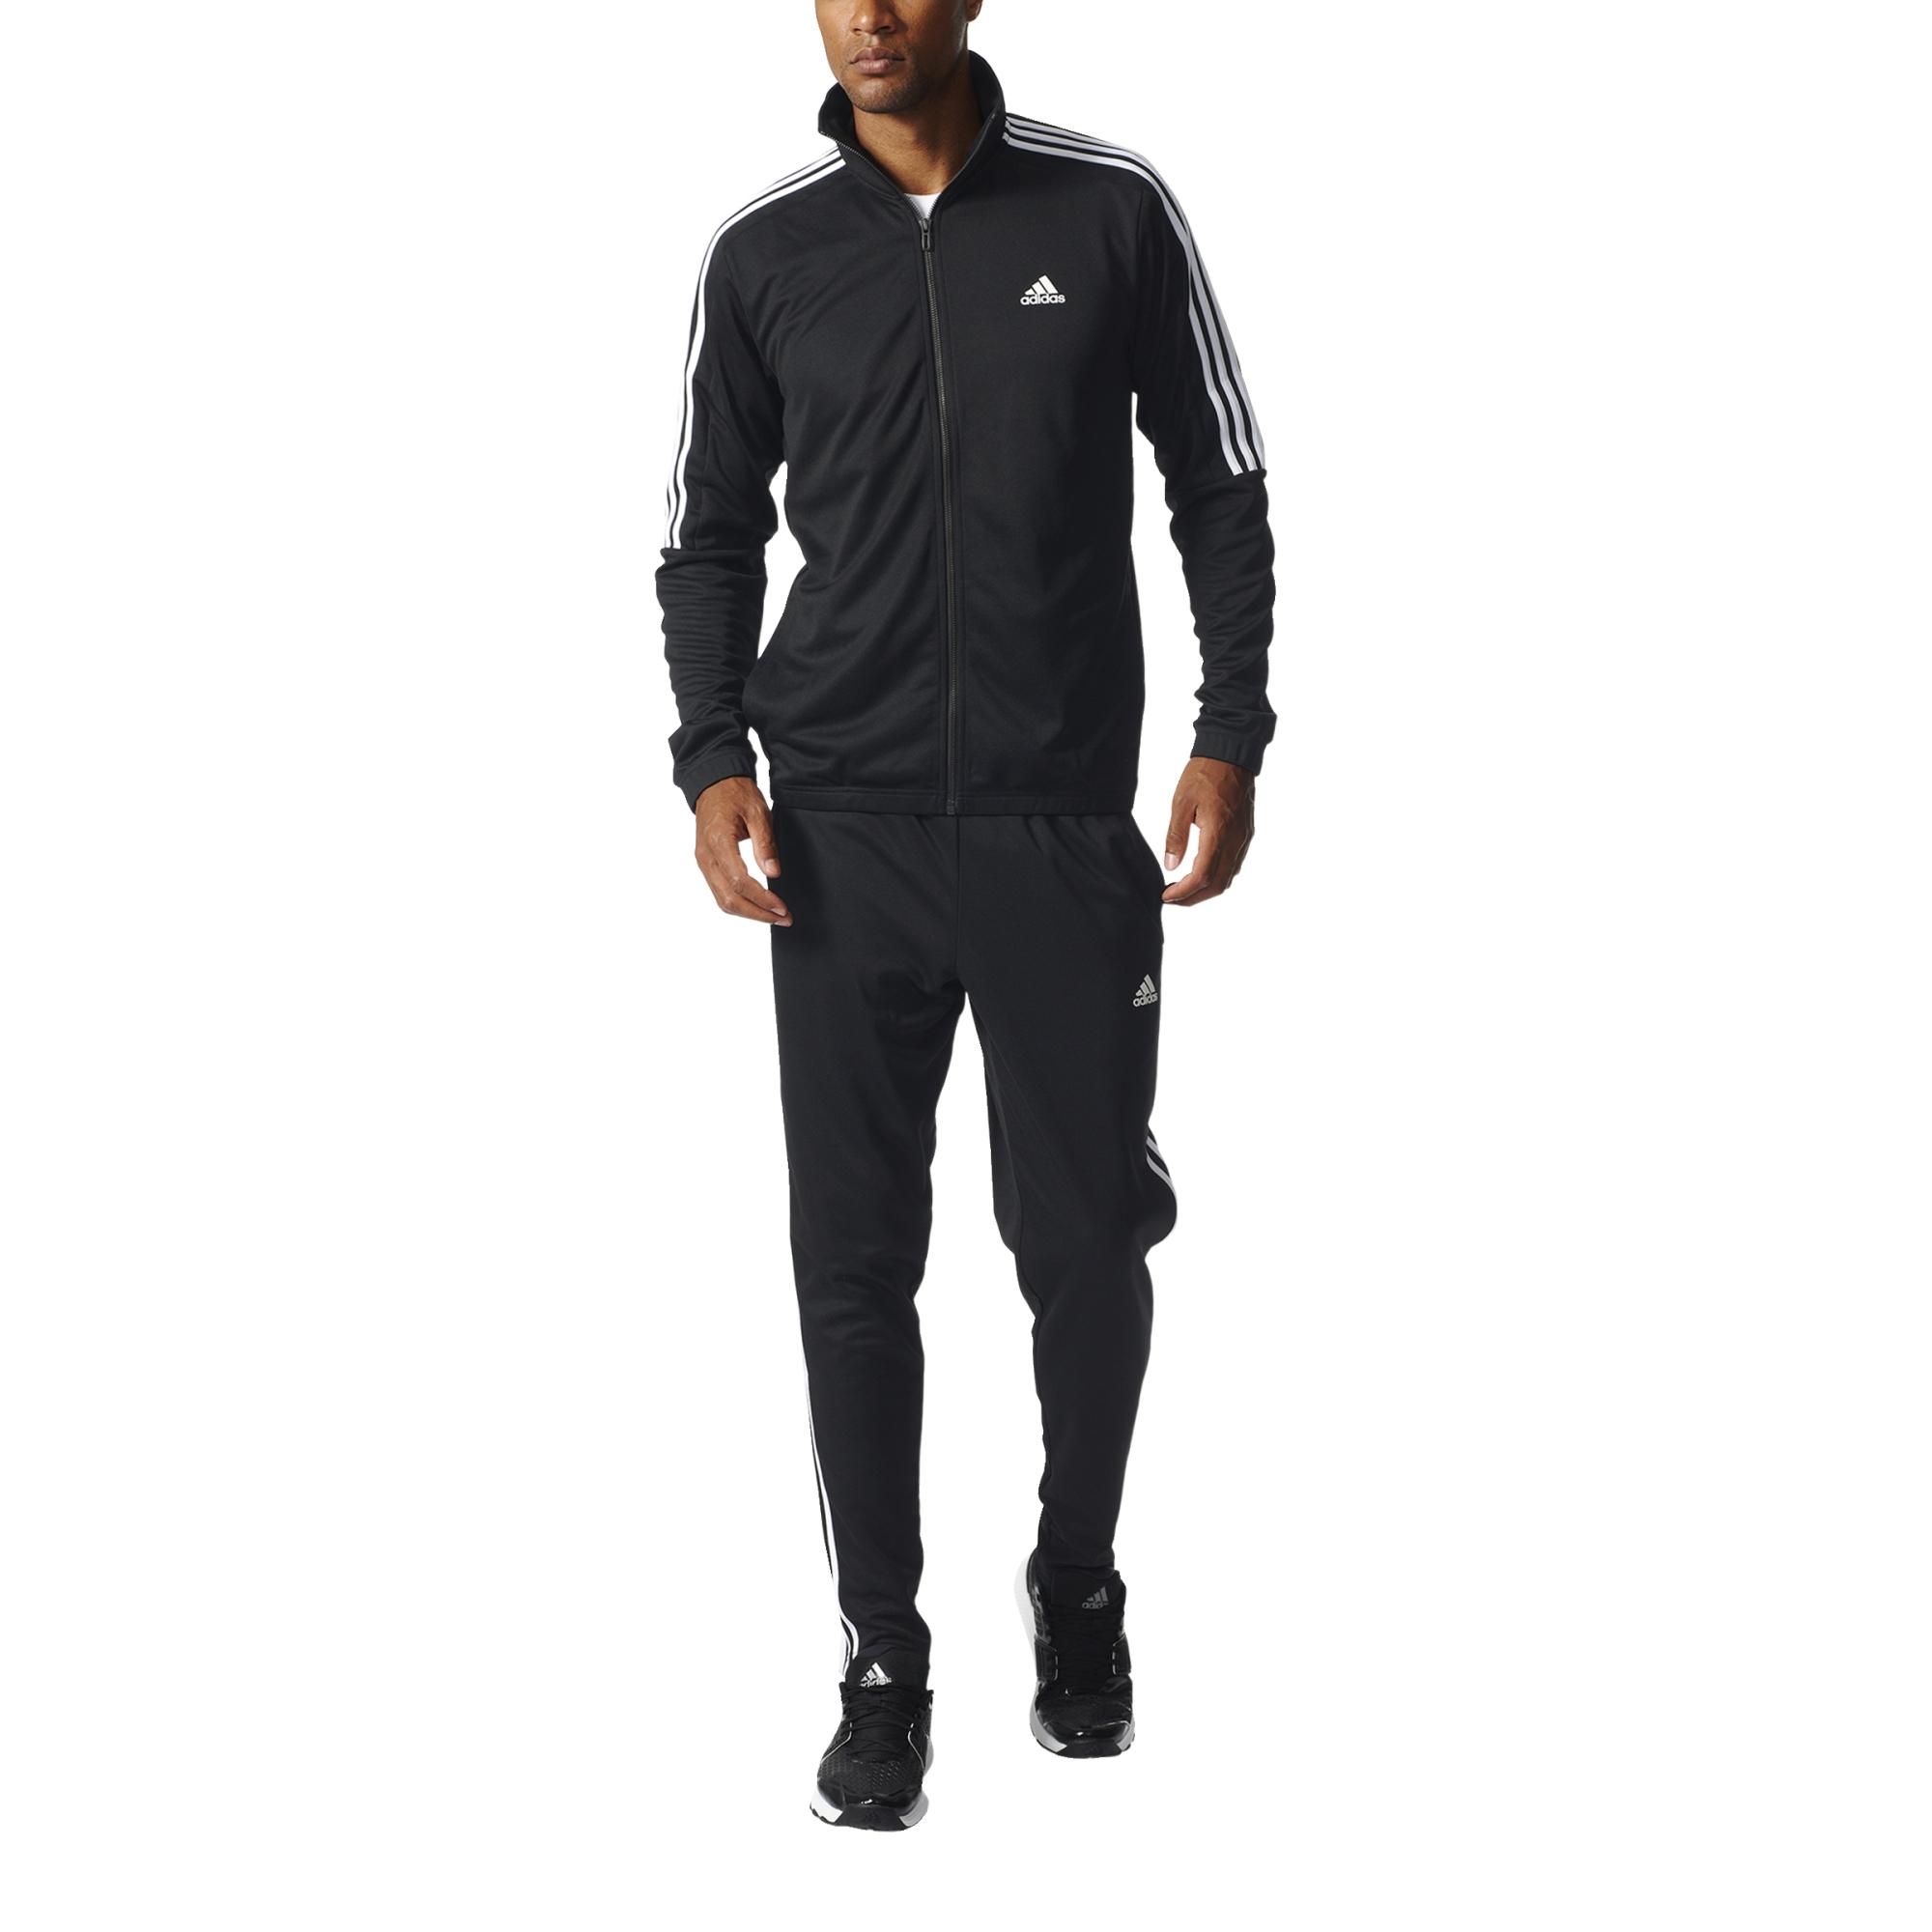 adidas tiro tracksuit herren trainingsanzug herren bekleidung trainingsbekleidung. Black Bedroom Furniture Sets. Home Design Ideas